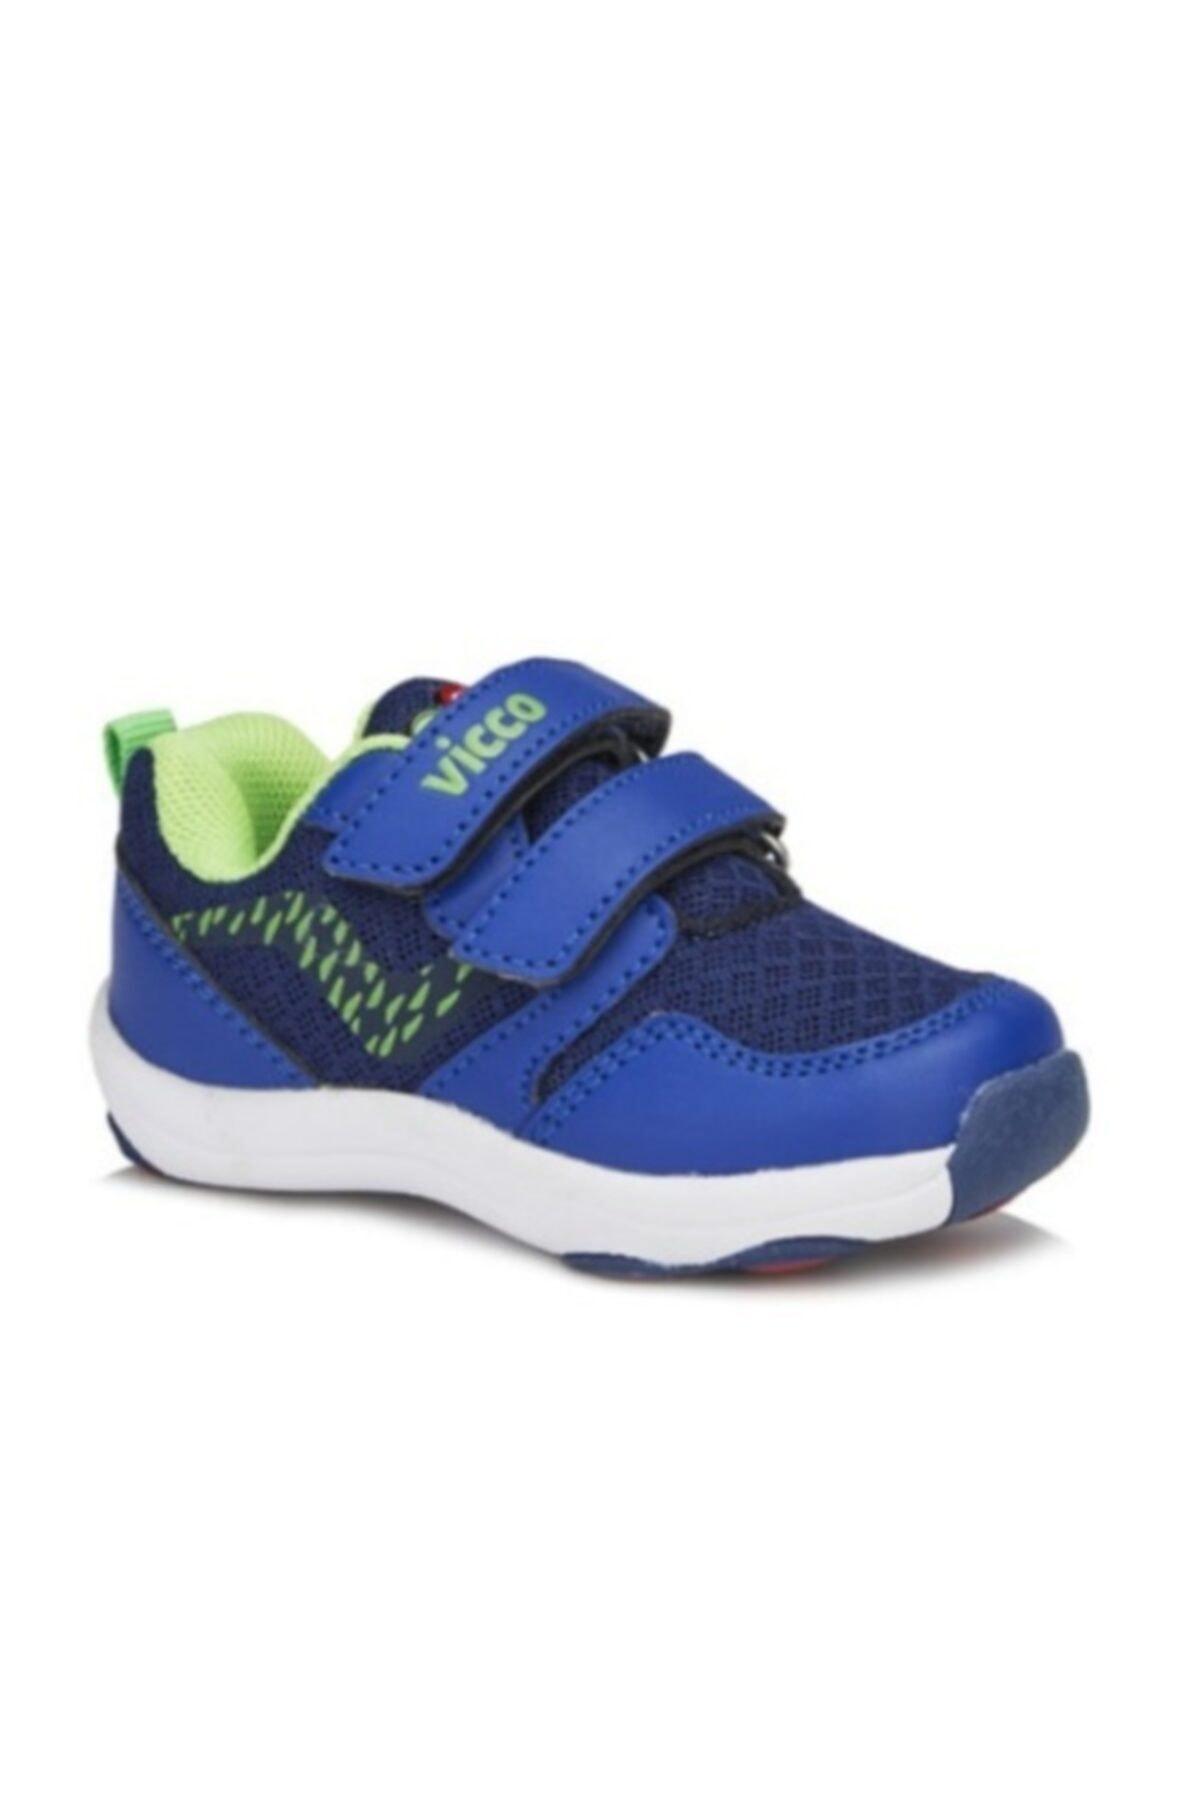 کفش پیاده روی نوزاد پسرانه ترک مجلسی برند Vicco رنگ لاجوردی کد ty37283992